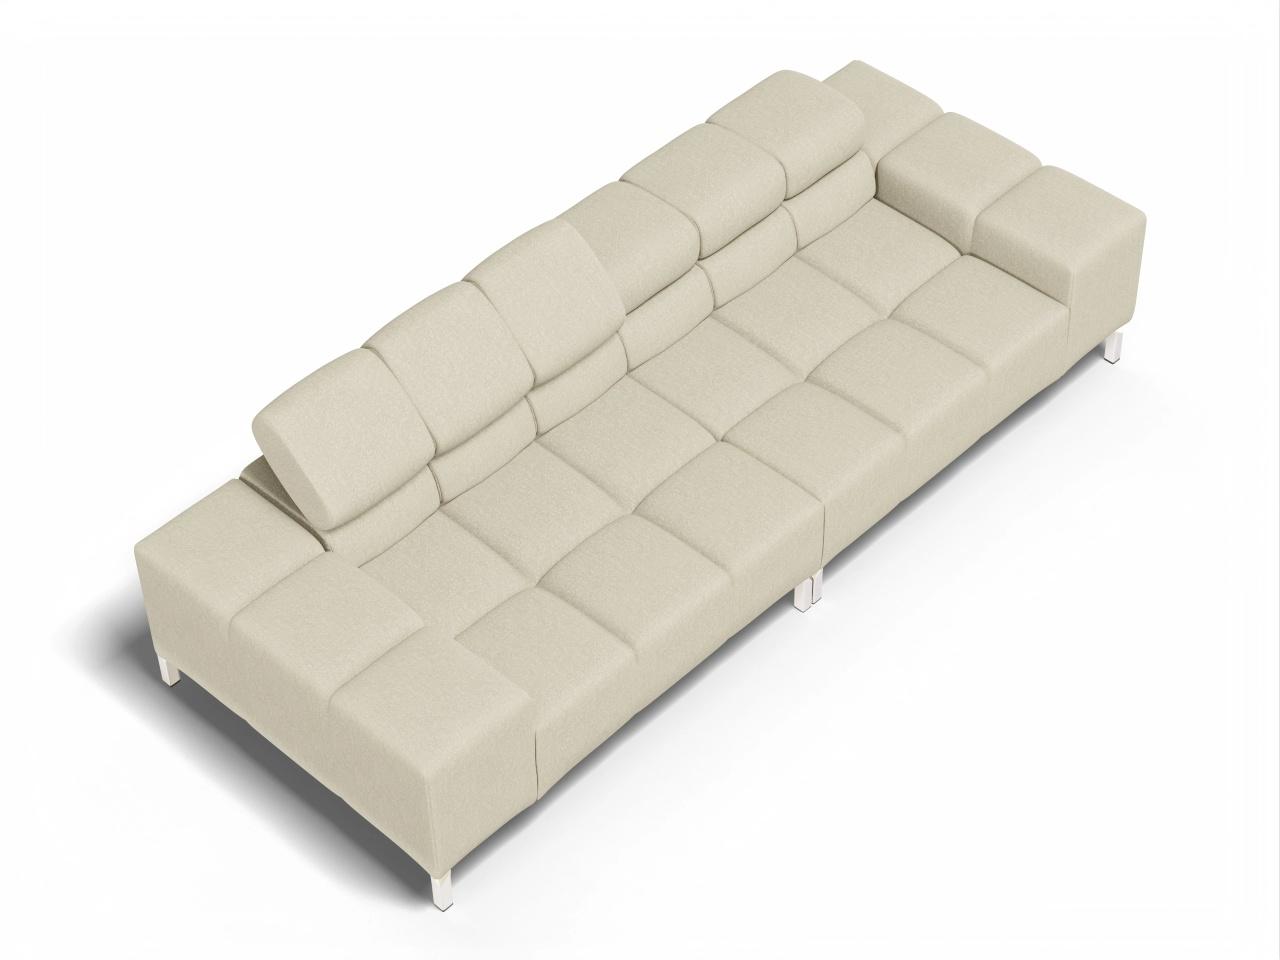 Wilo 3-Sitzer Sofa